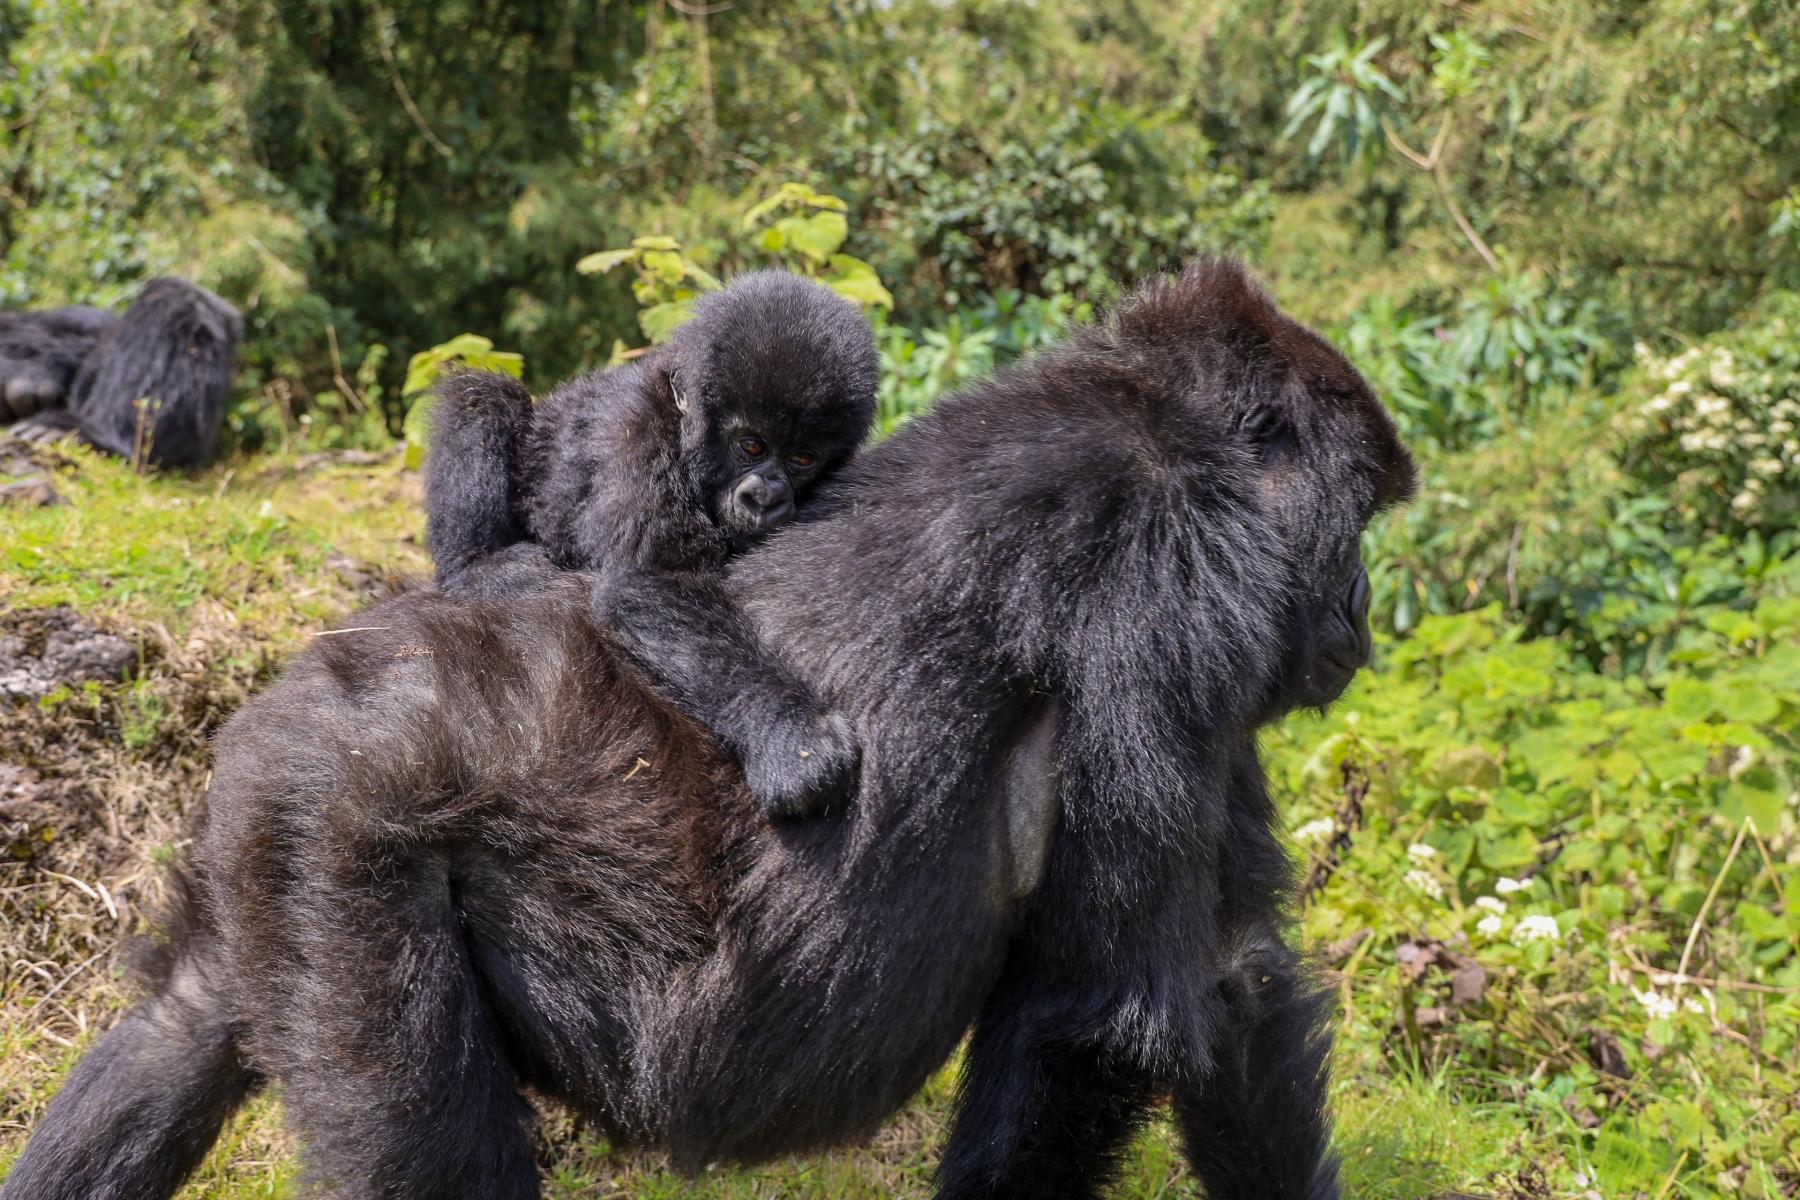 Rwanda-Gorilla-Trekking-Photo-Credit-Kate-Webster-098